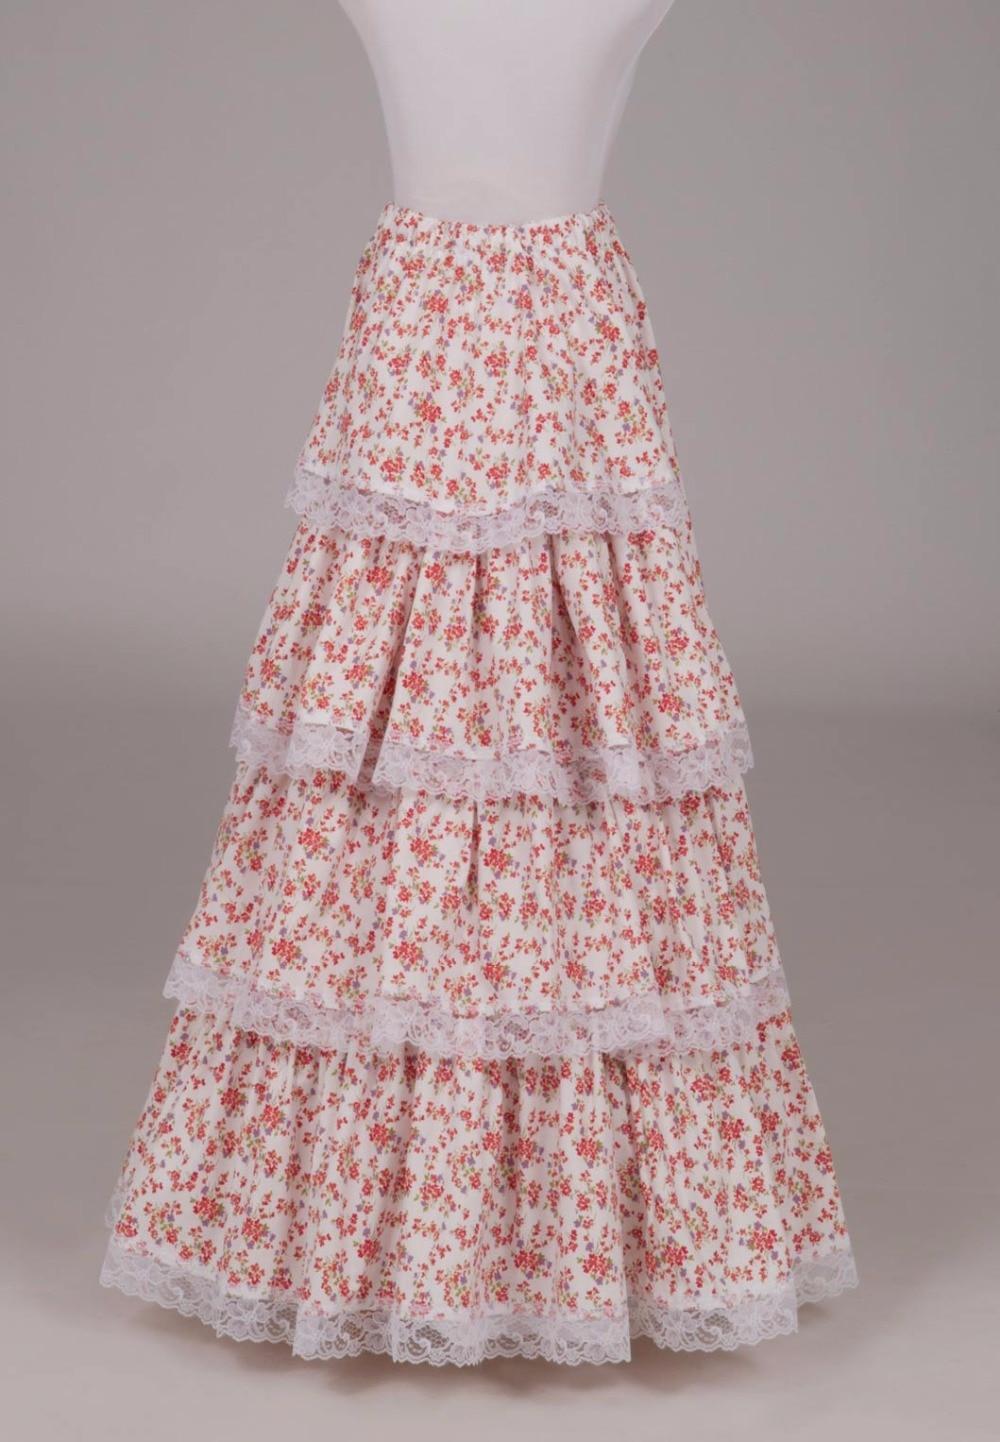 Ruffled Print Victorian Skirt Victorian French Pleated Gathered Bustle Skirts майка print bar victorian ouija